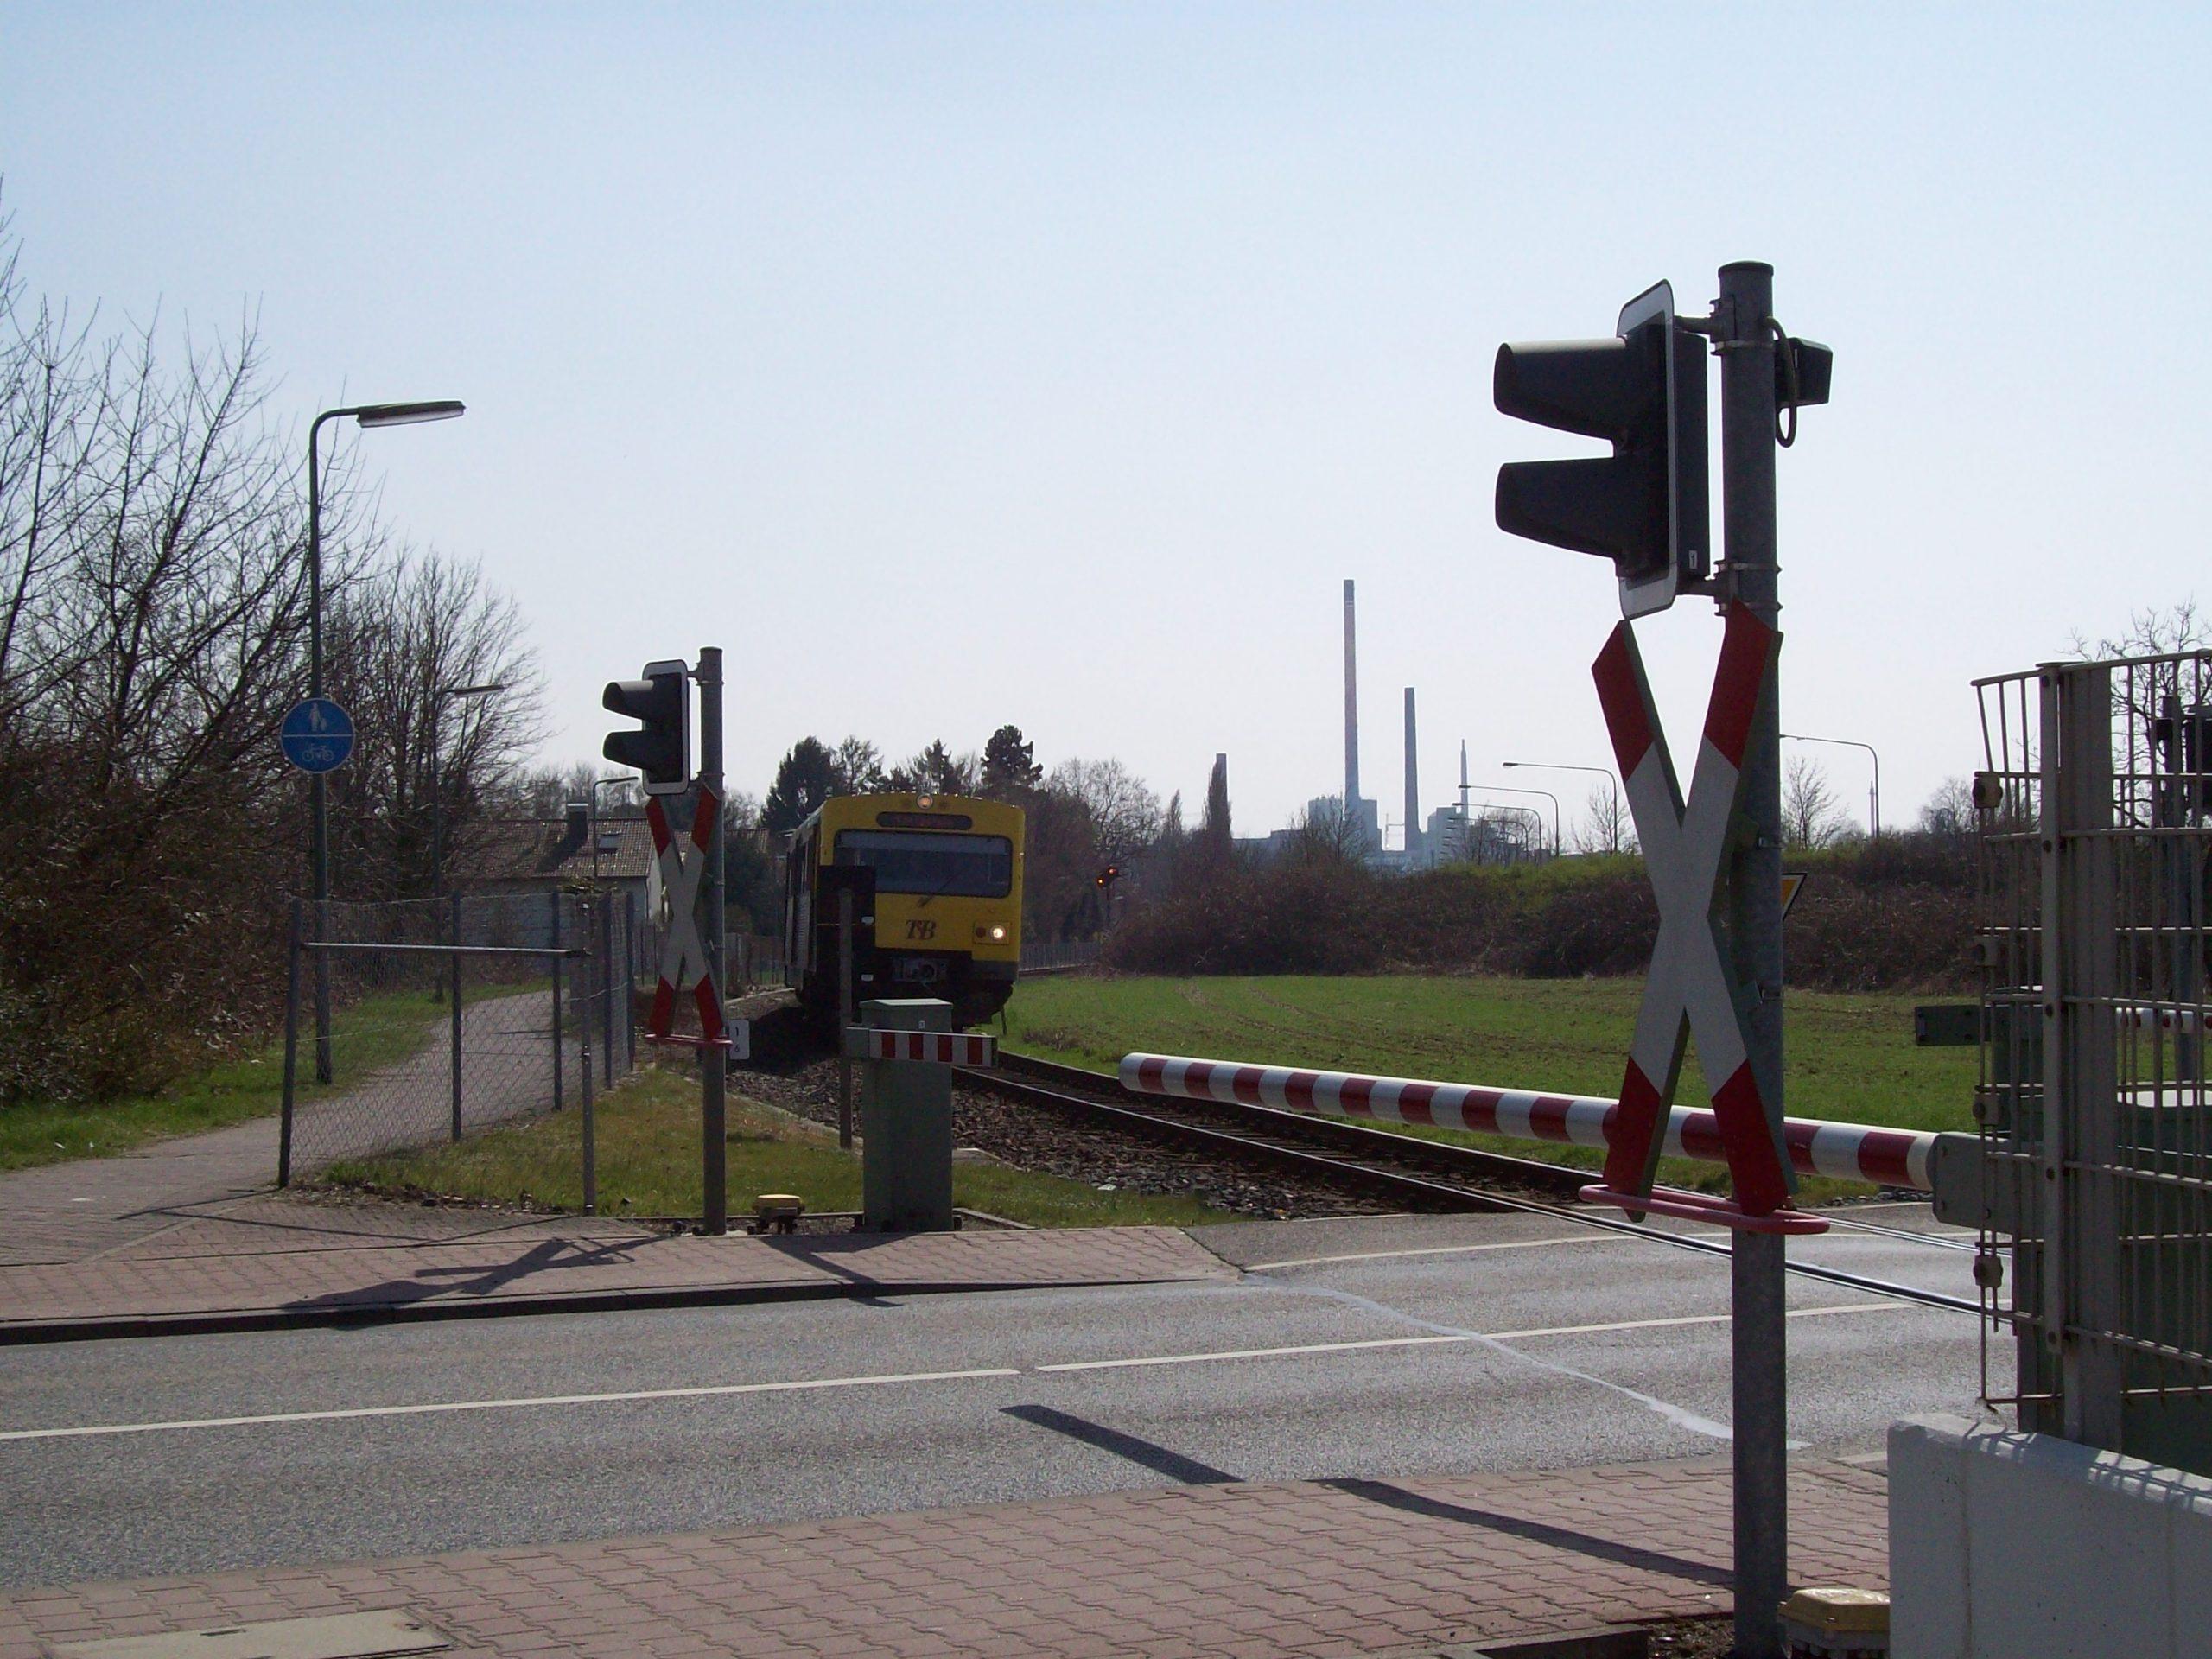 Bahnhof_11